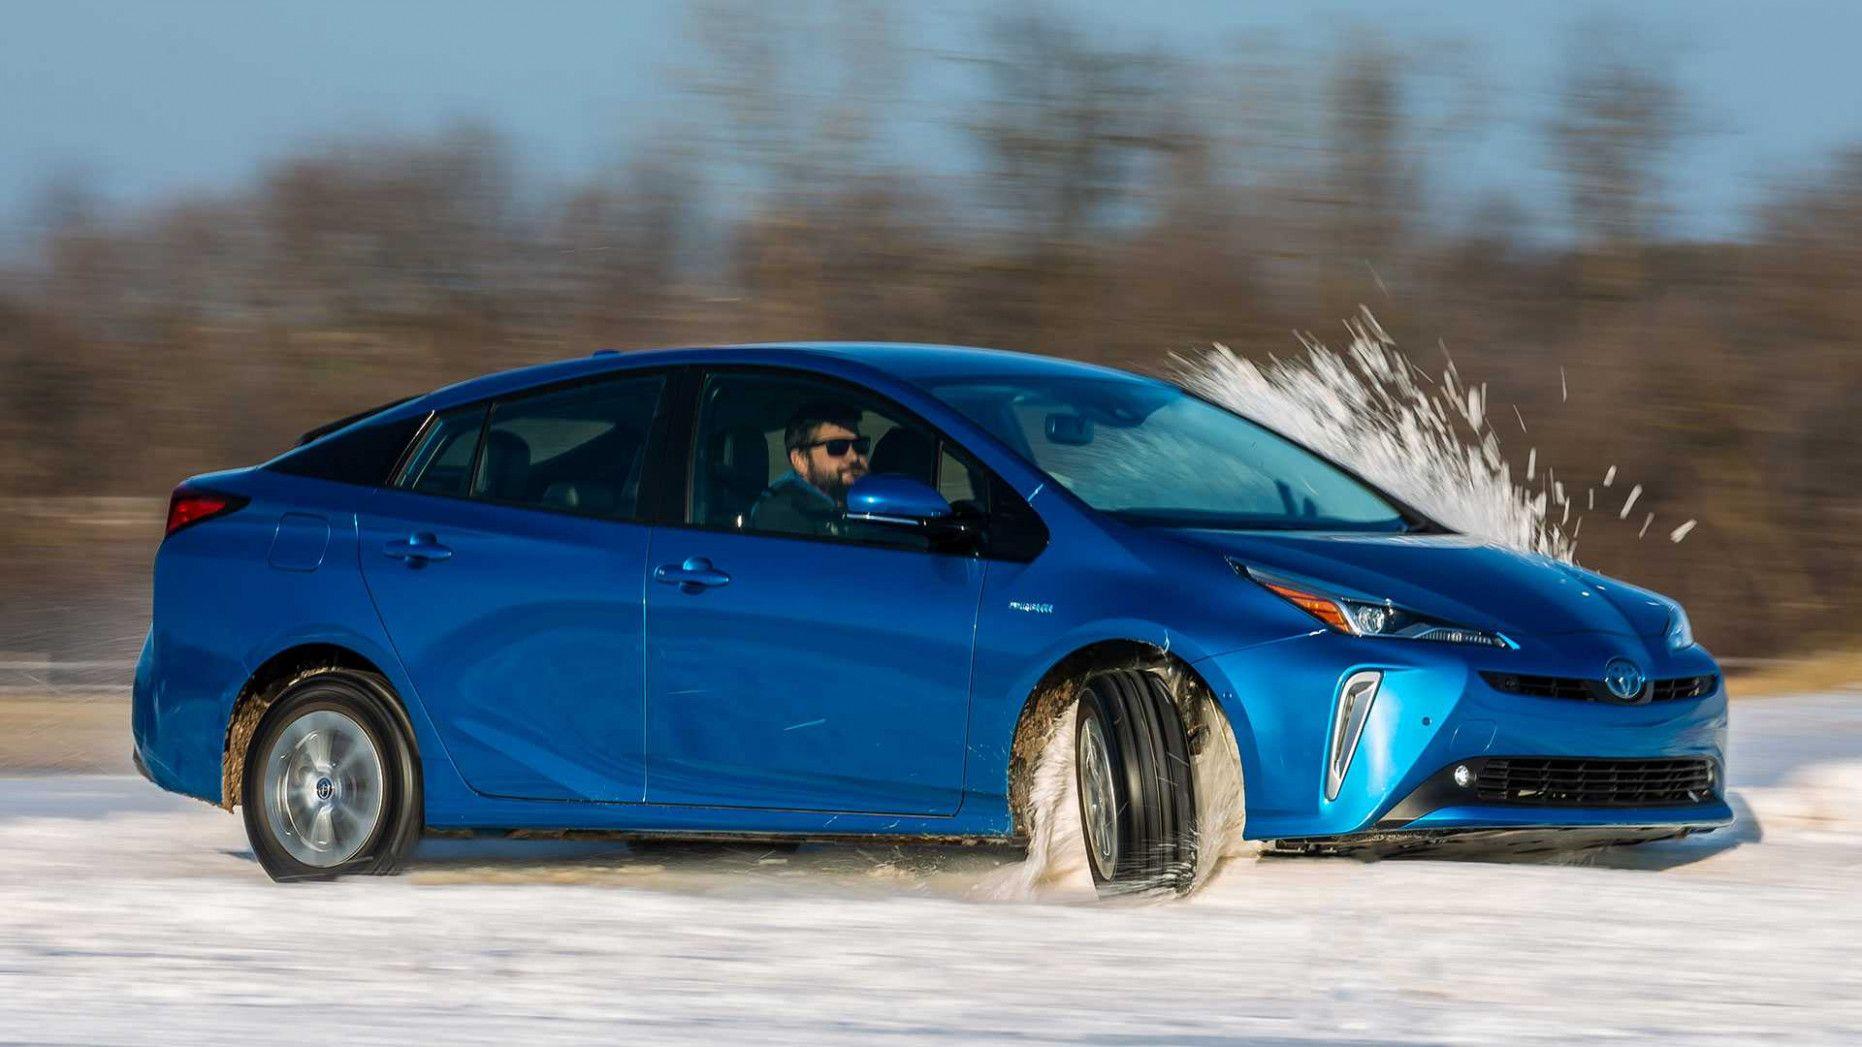 The Latest Trend In 2020 Toyota Prius Toyota Prius Prius Toyota